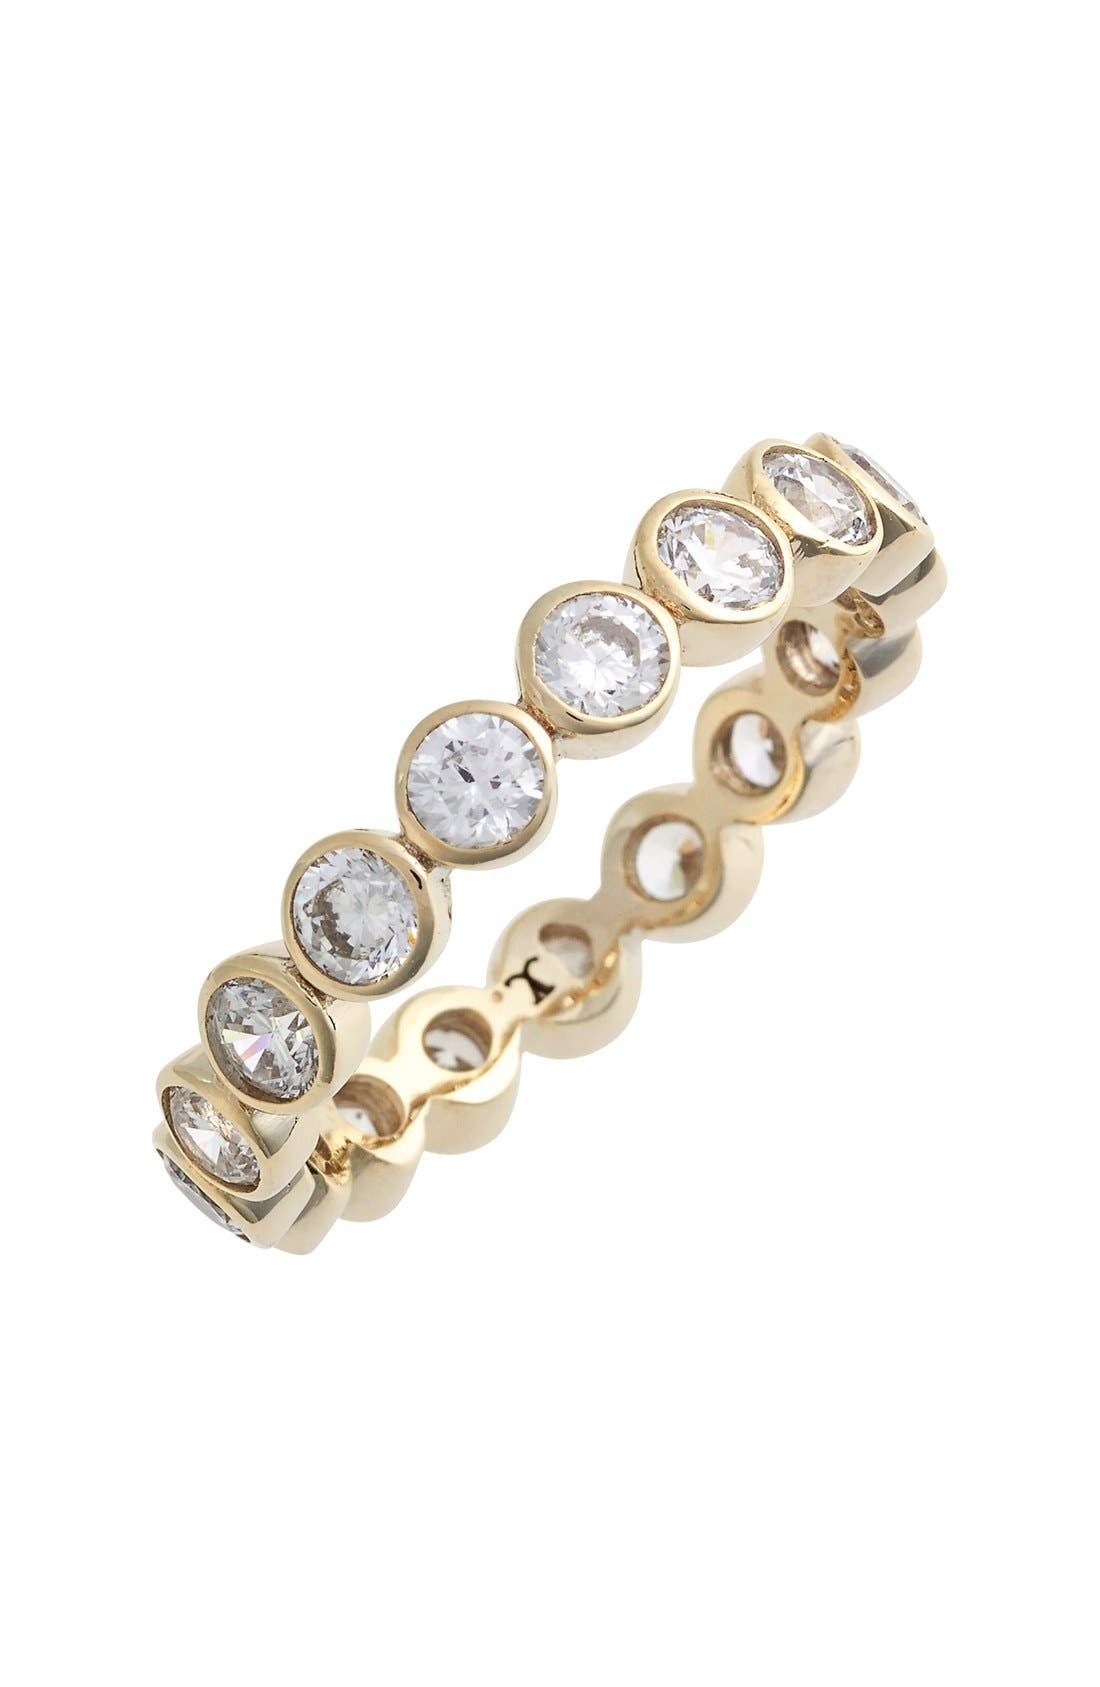 Alternate Image 1 Selected - Judith Jack Stackable Cubic Zirconia Bezel Ring